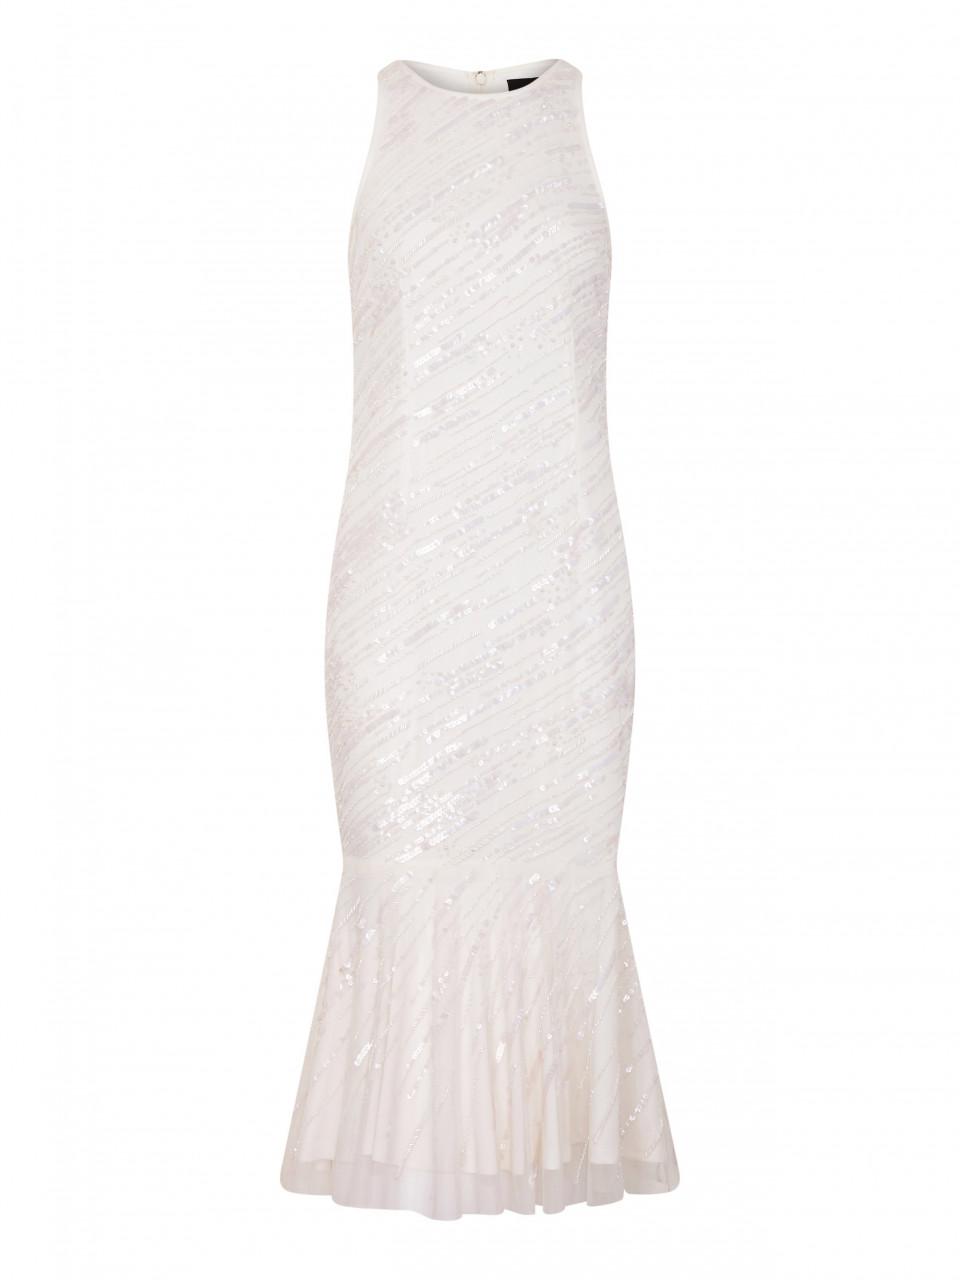 Beaded Cocktail Dress With Halter Neckline